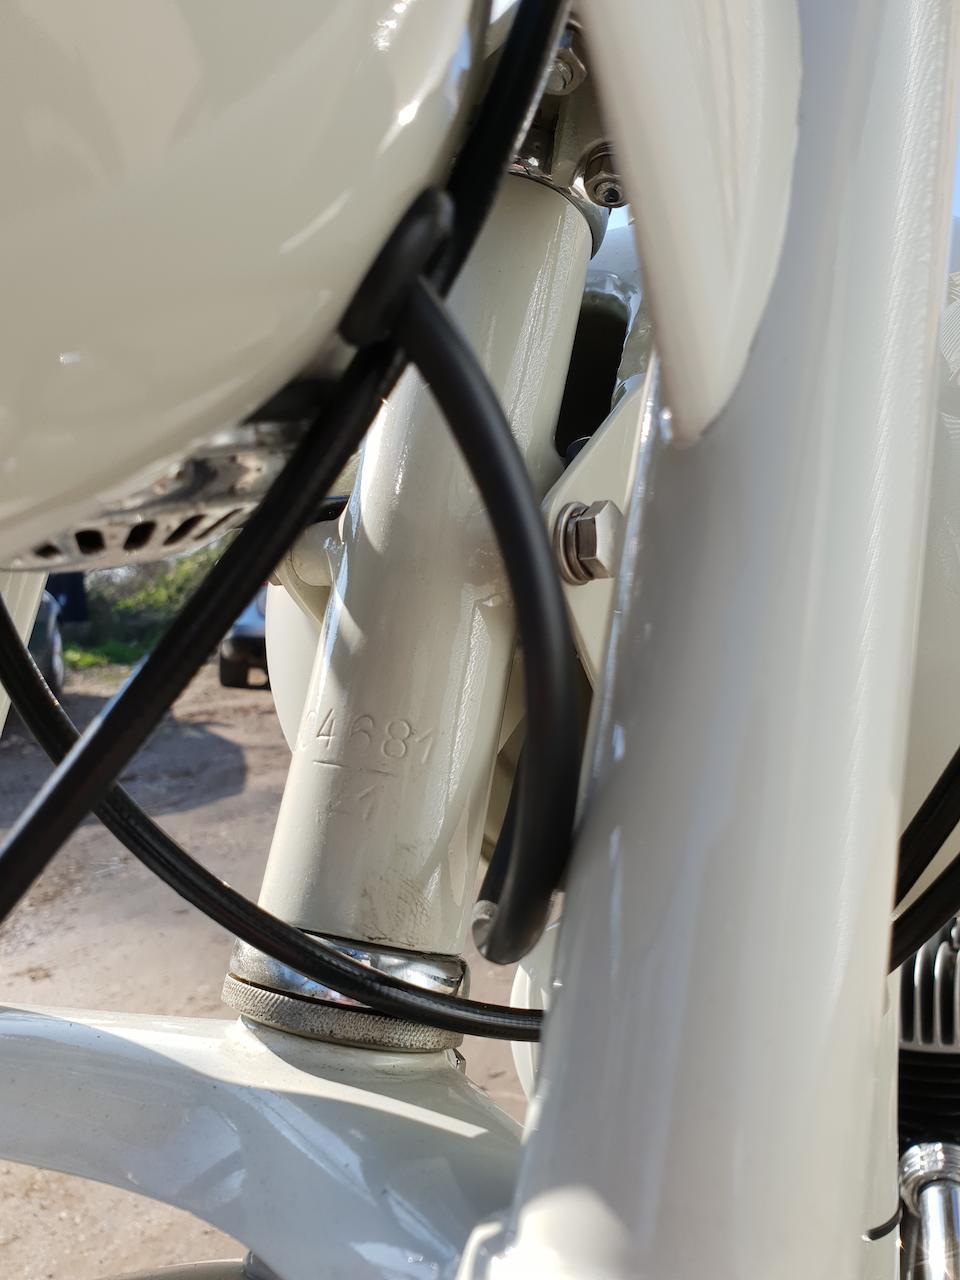 c.1954 MV Agusta 125cc Pullman Frame no. 504681 Engine no. 505121